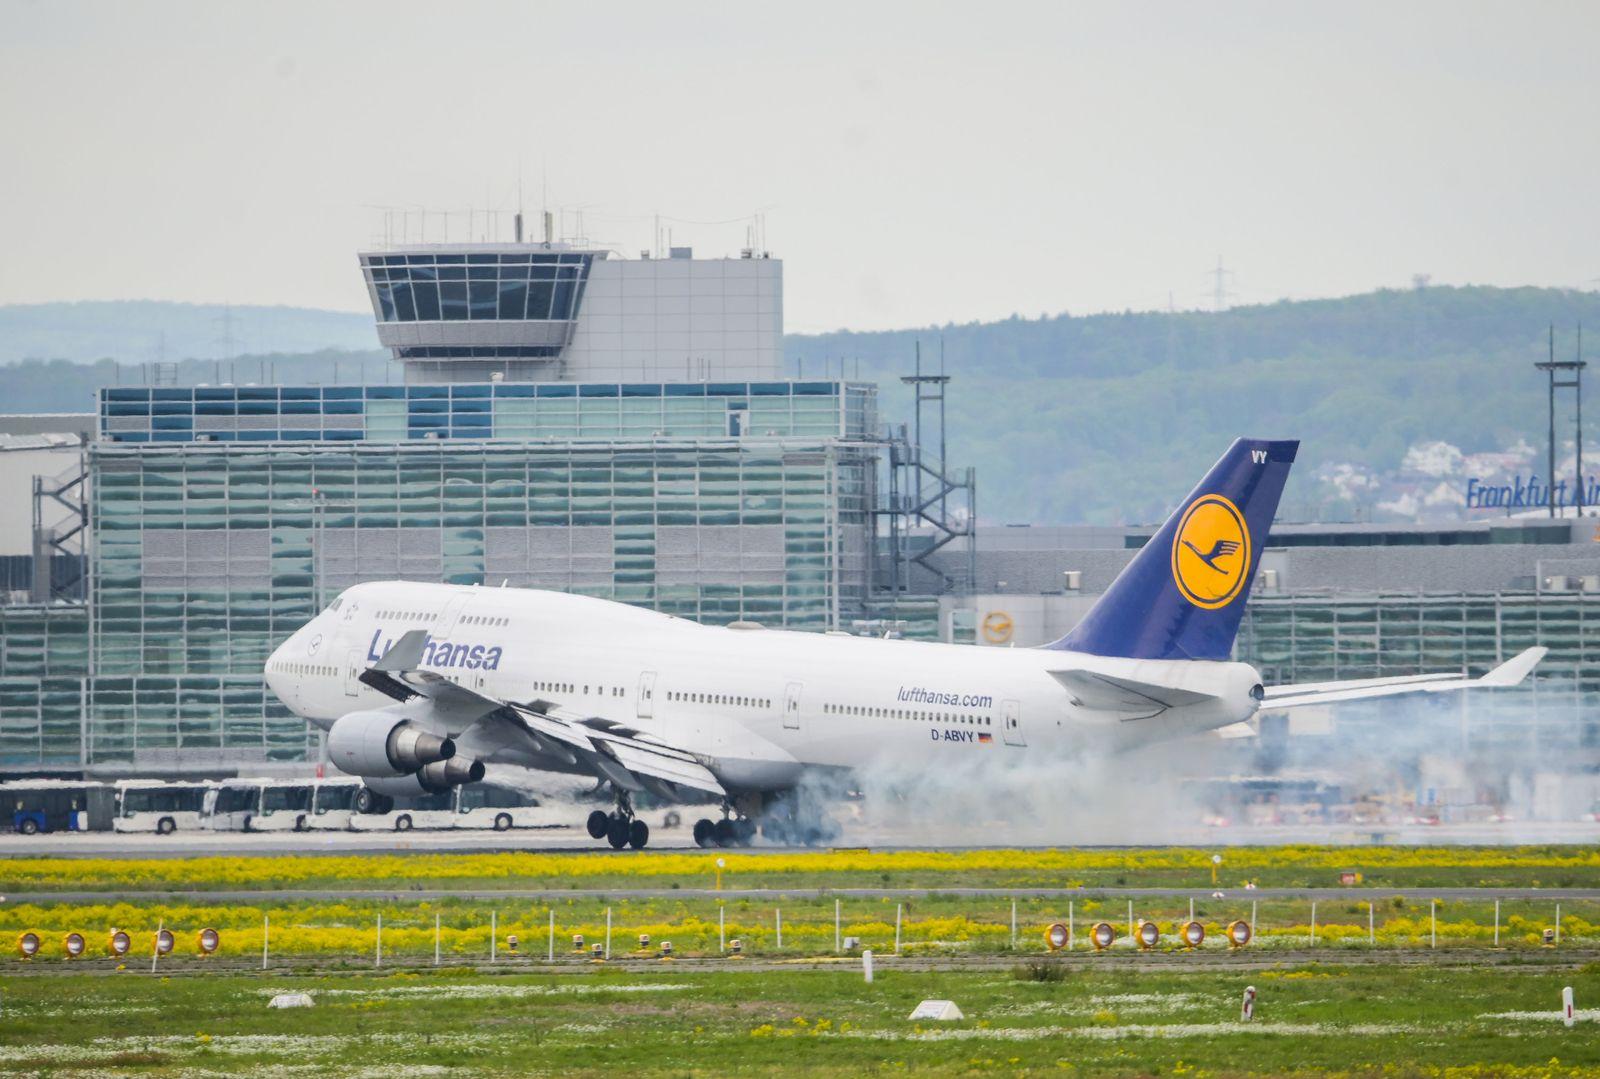 Frankfurter Flughafen / Lufthansa